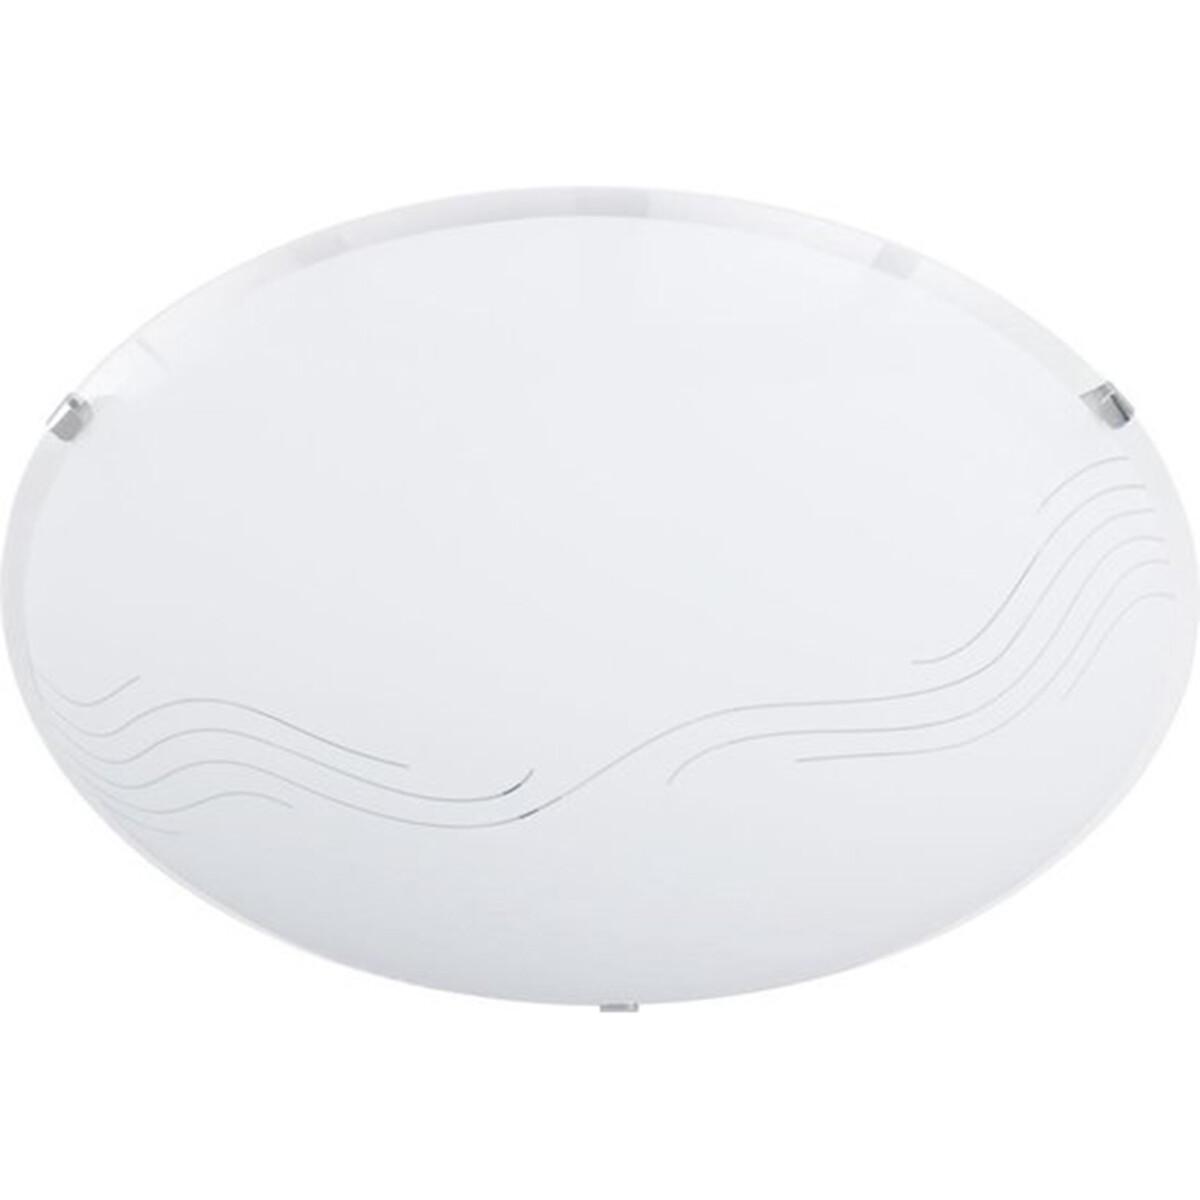 LED Plafondlamp - Plafondverlichting - Trion Nirona - E27 Fitting - 2-lichts - Rond - Mat Nikkel - A